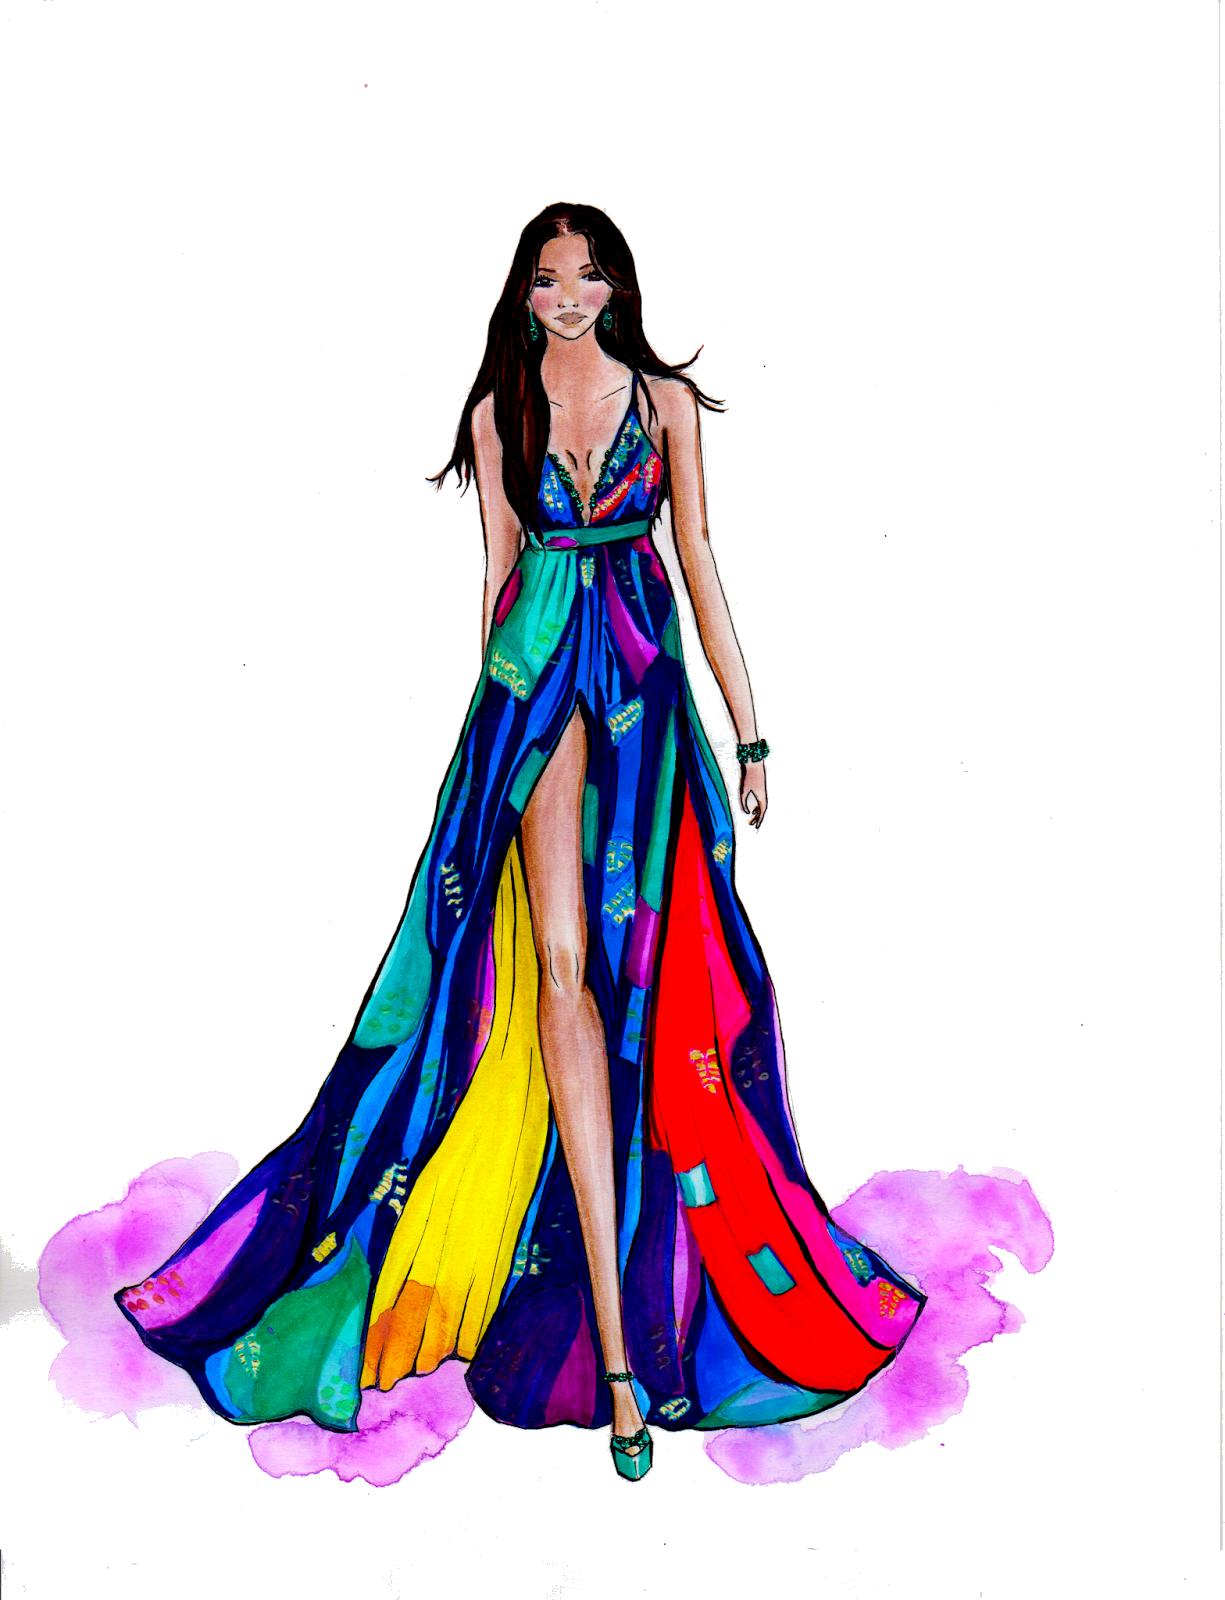 Download Fashion Model Transparent HQ PNG Image | FreePNGImg